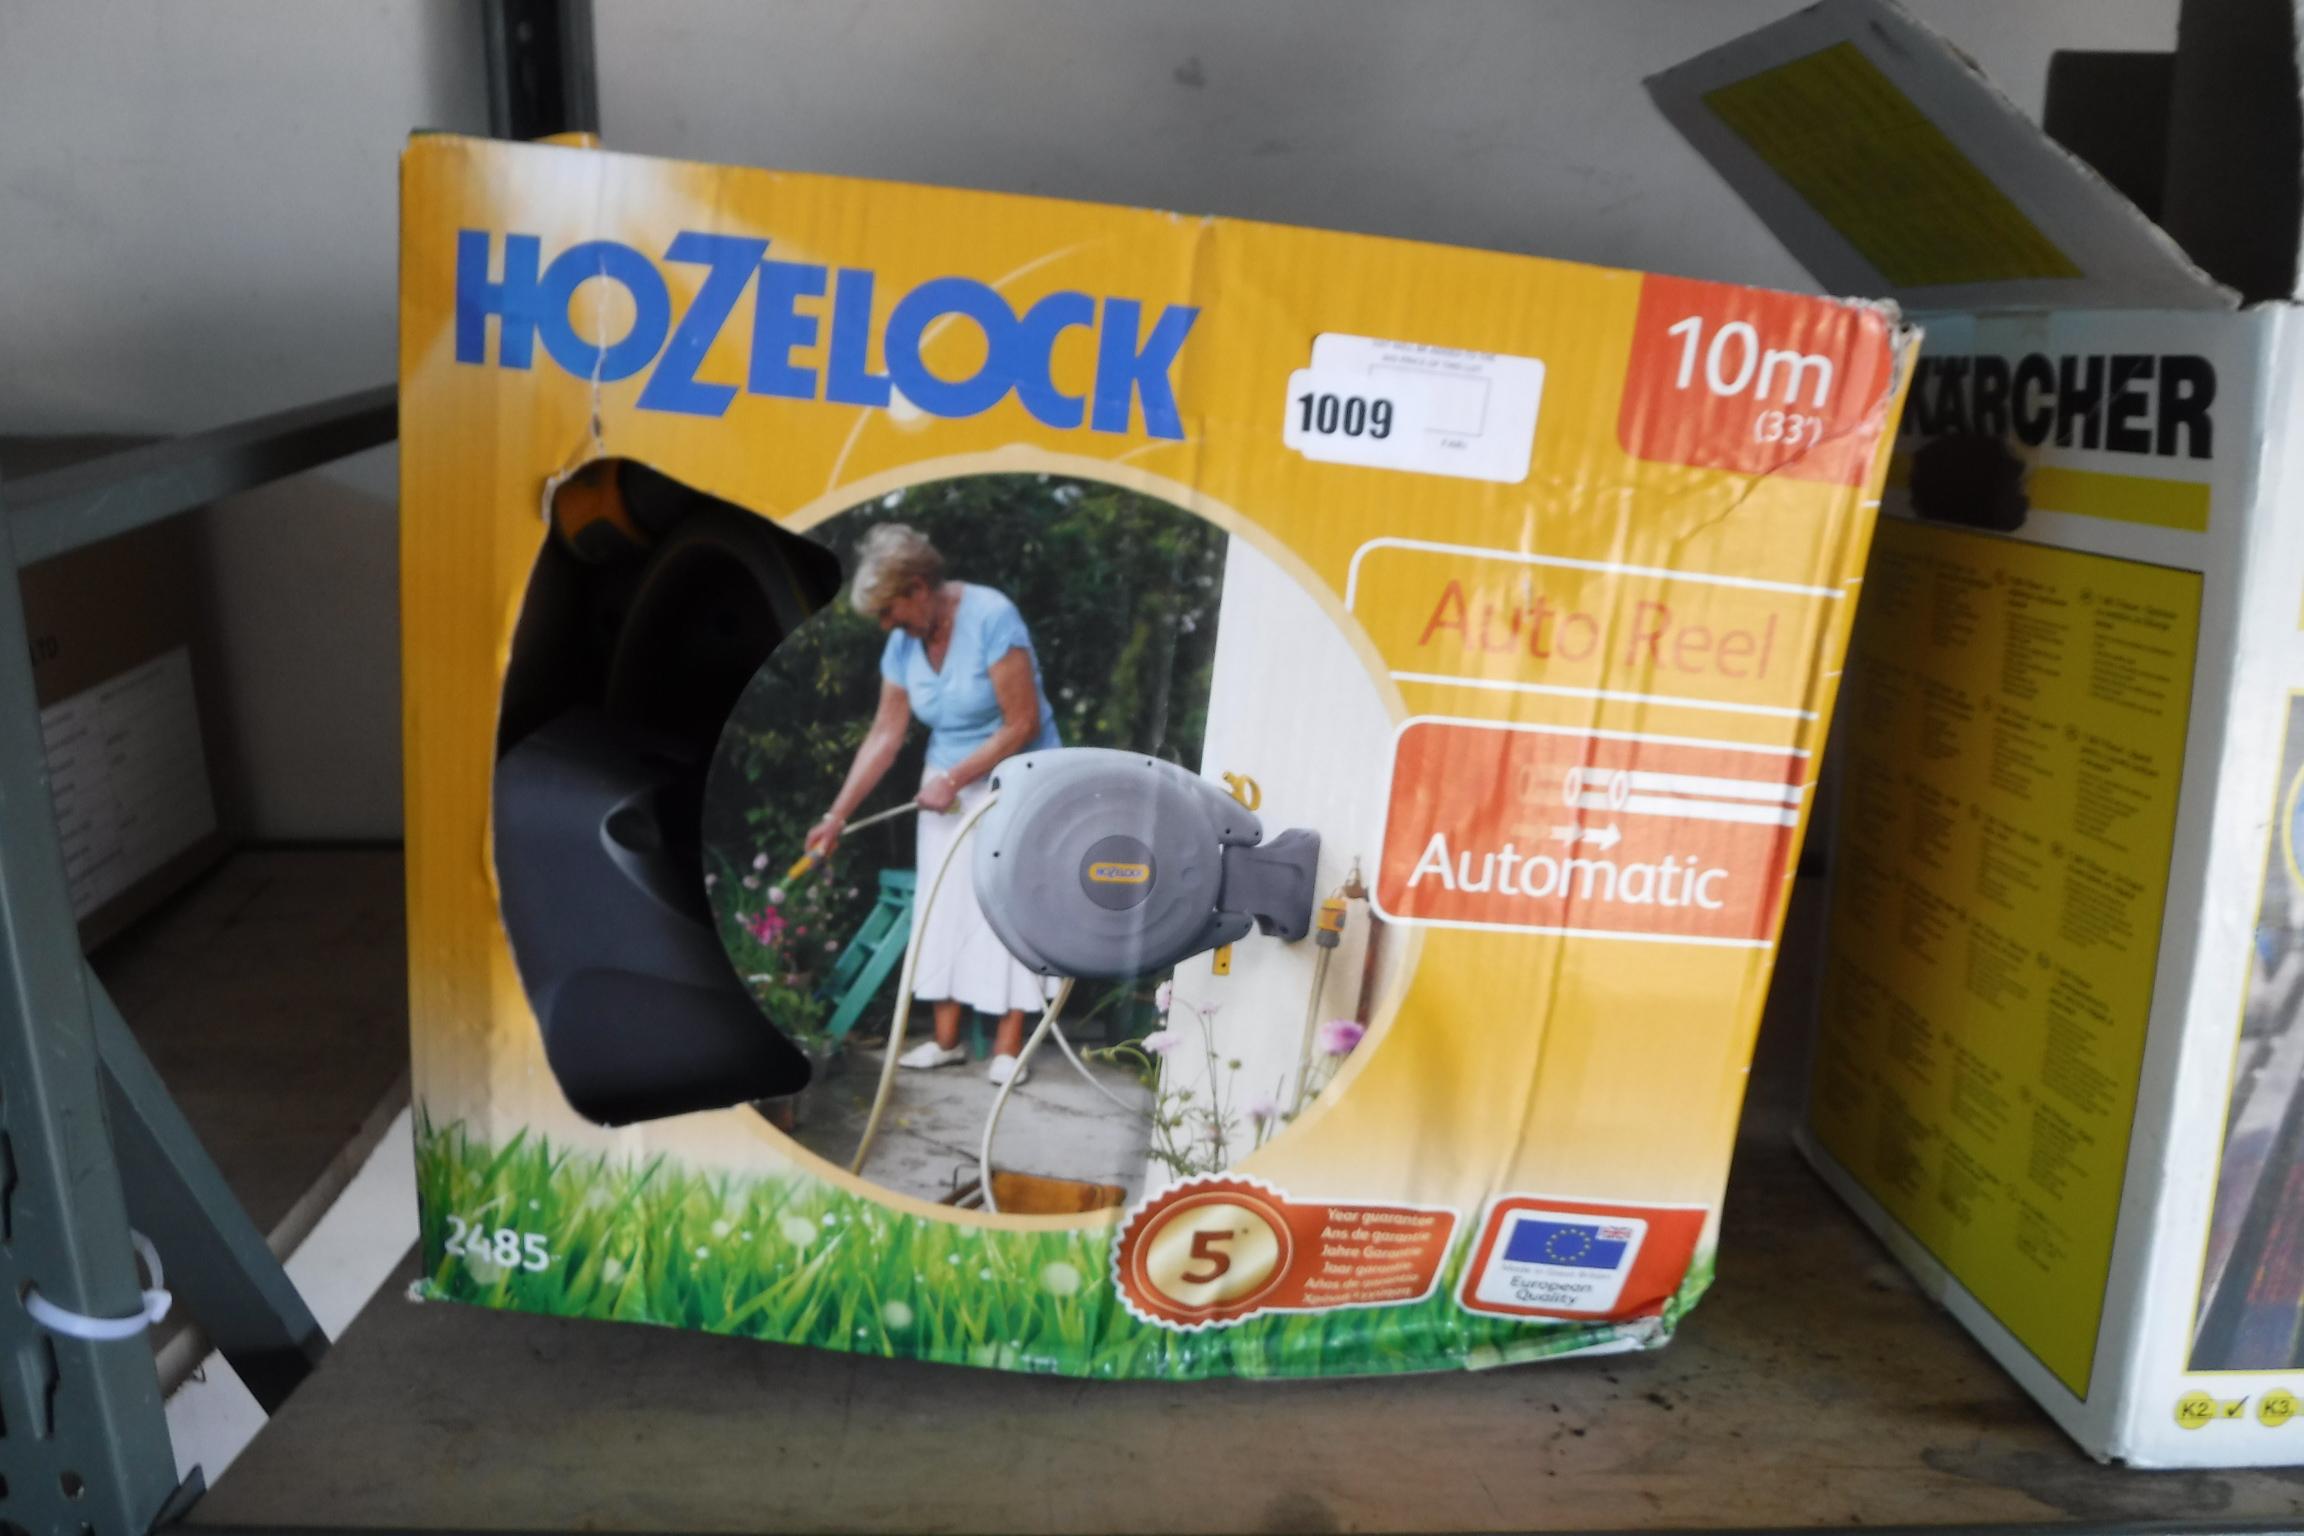 Hozelock 10m auto reel hose